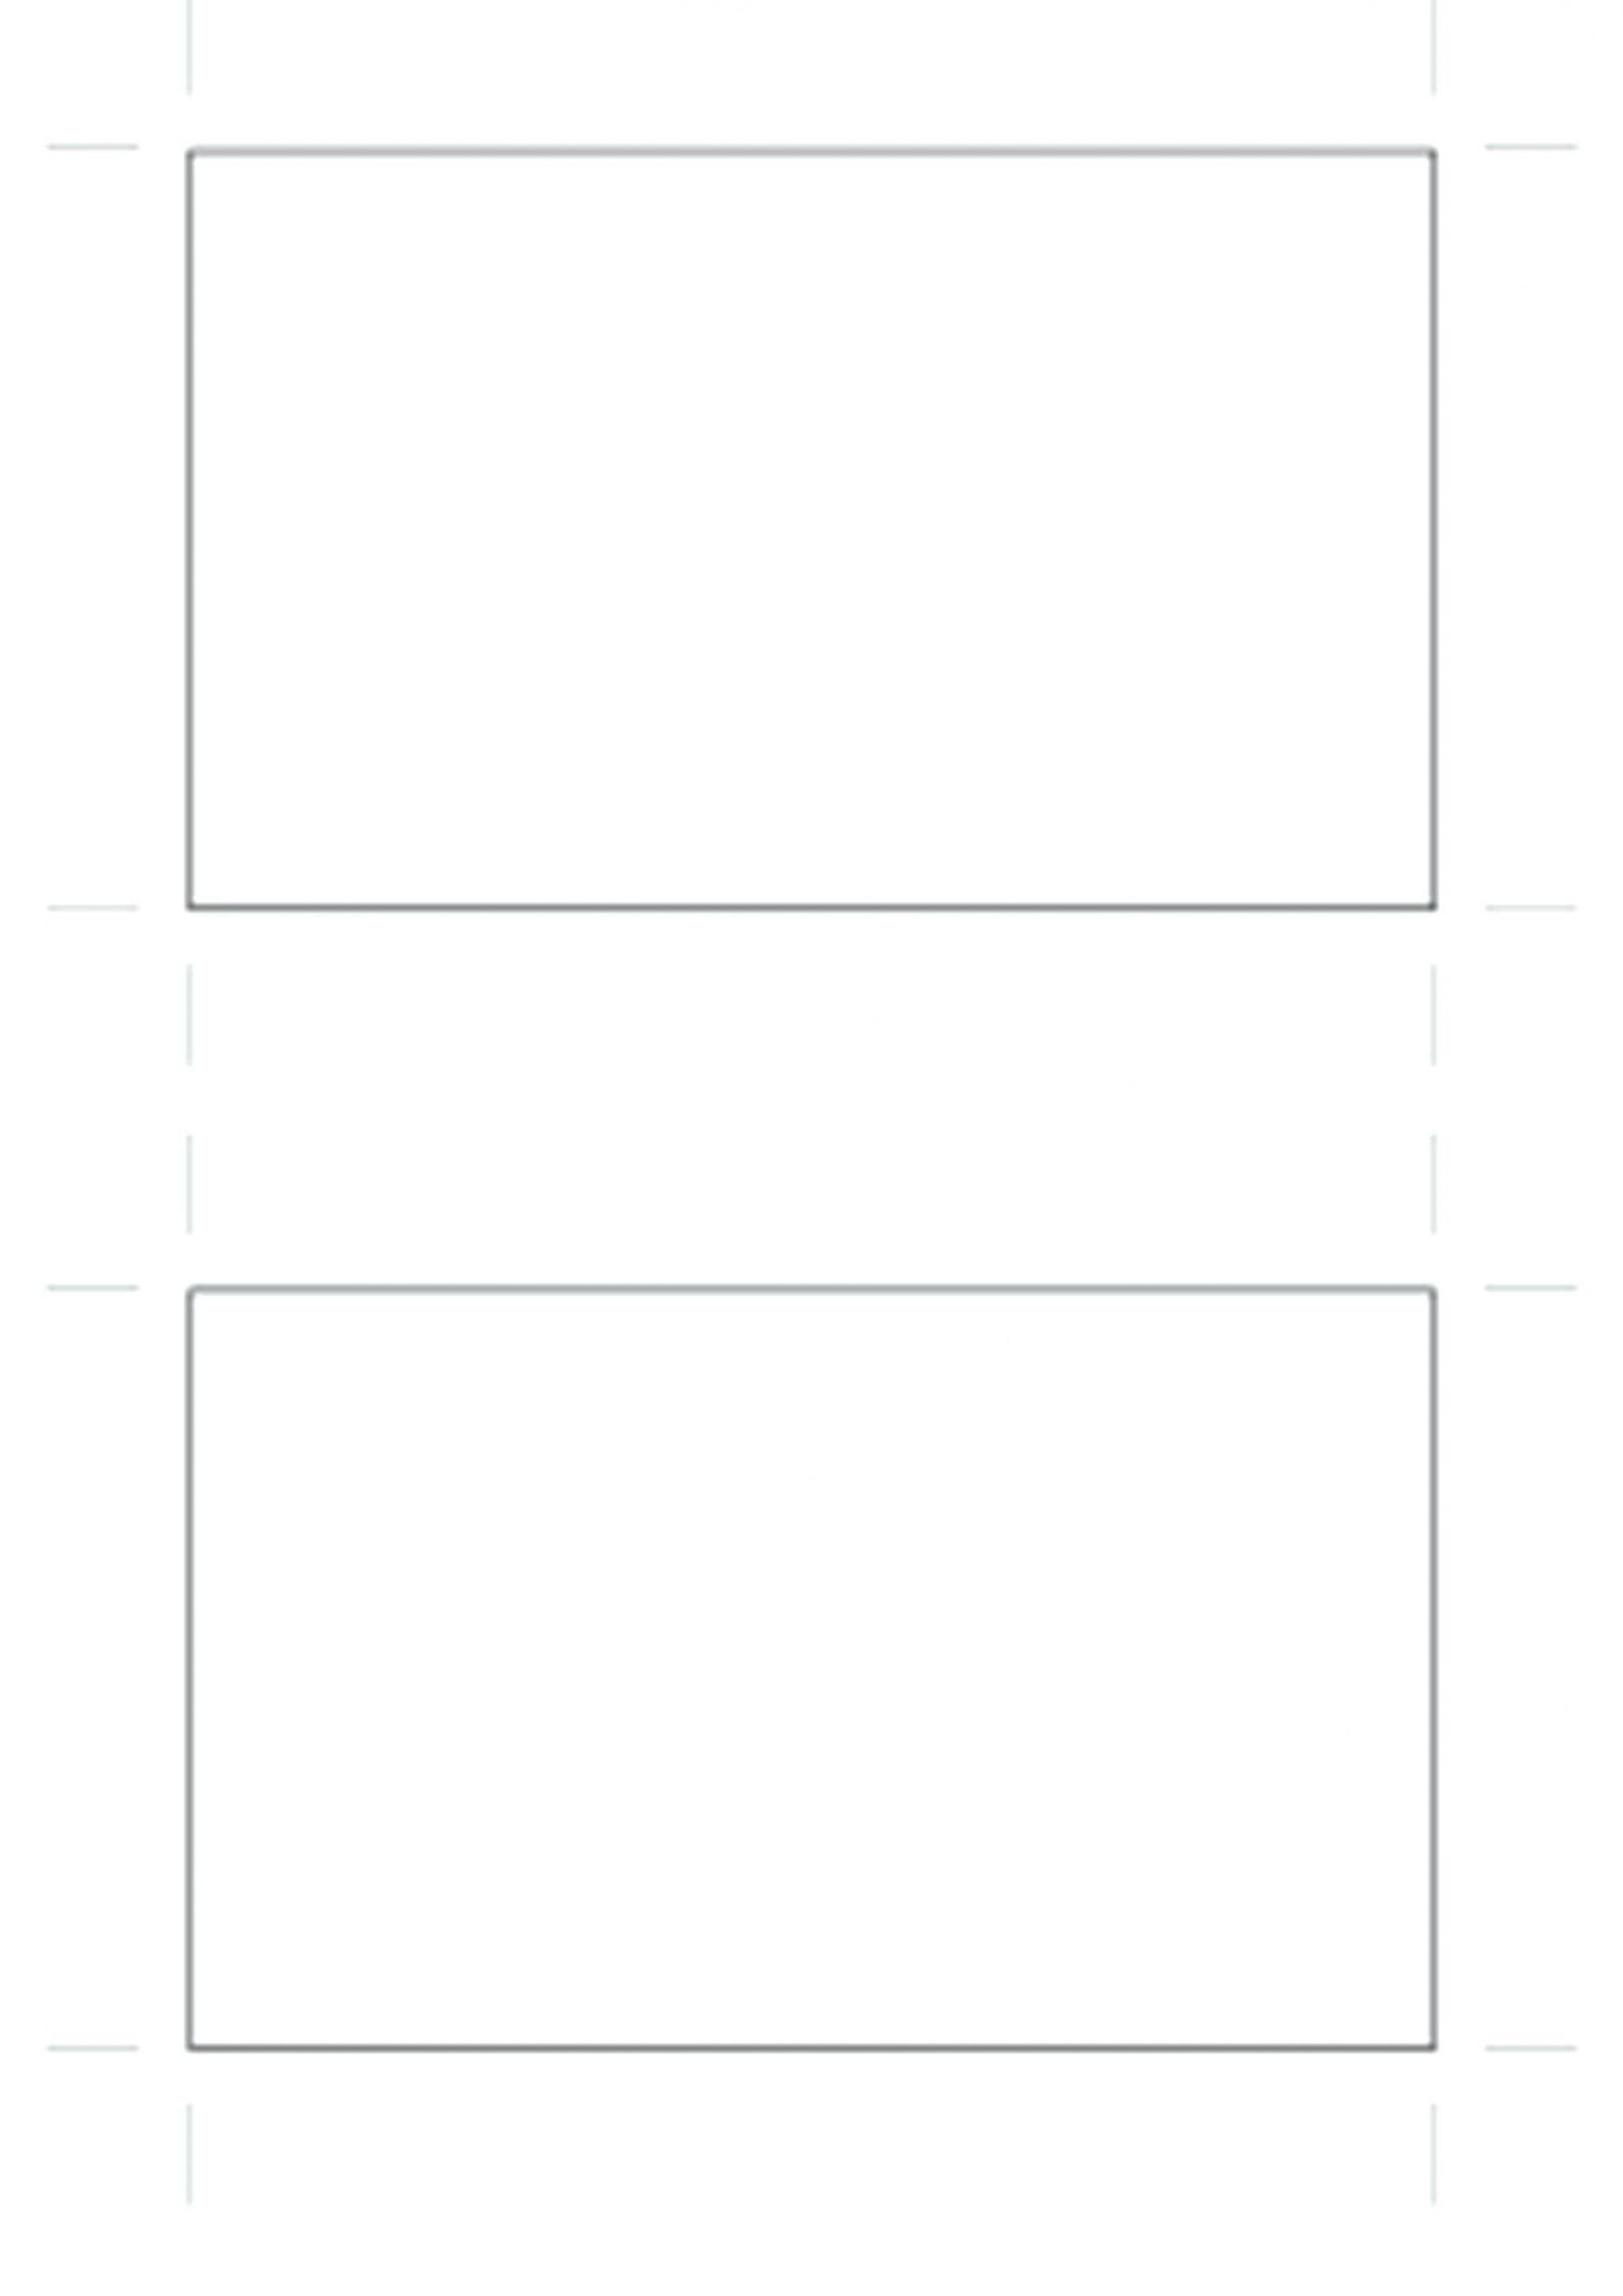 Tri Fold Brochure Blank Templates Free Download